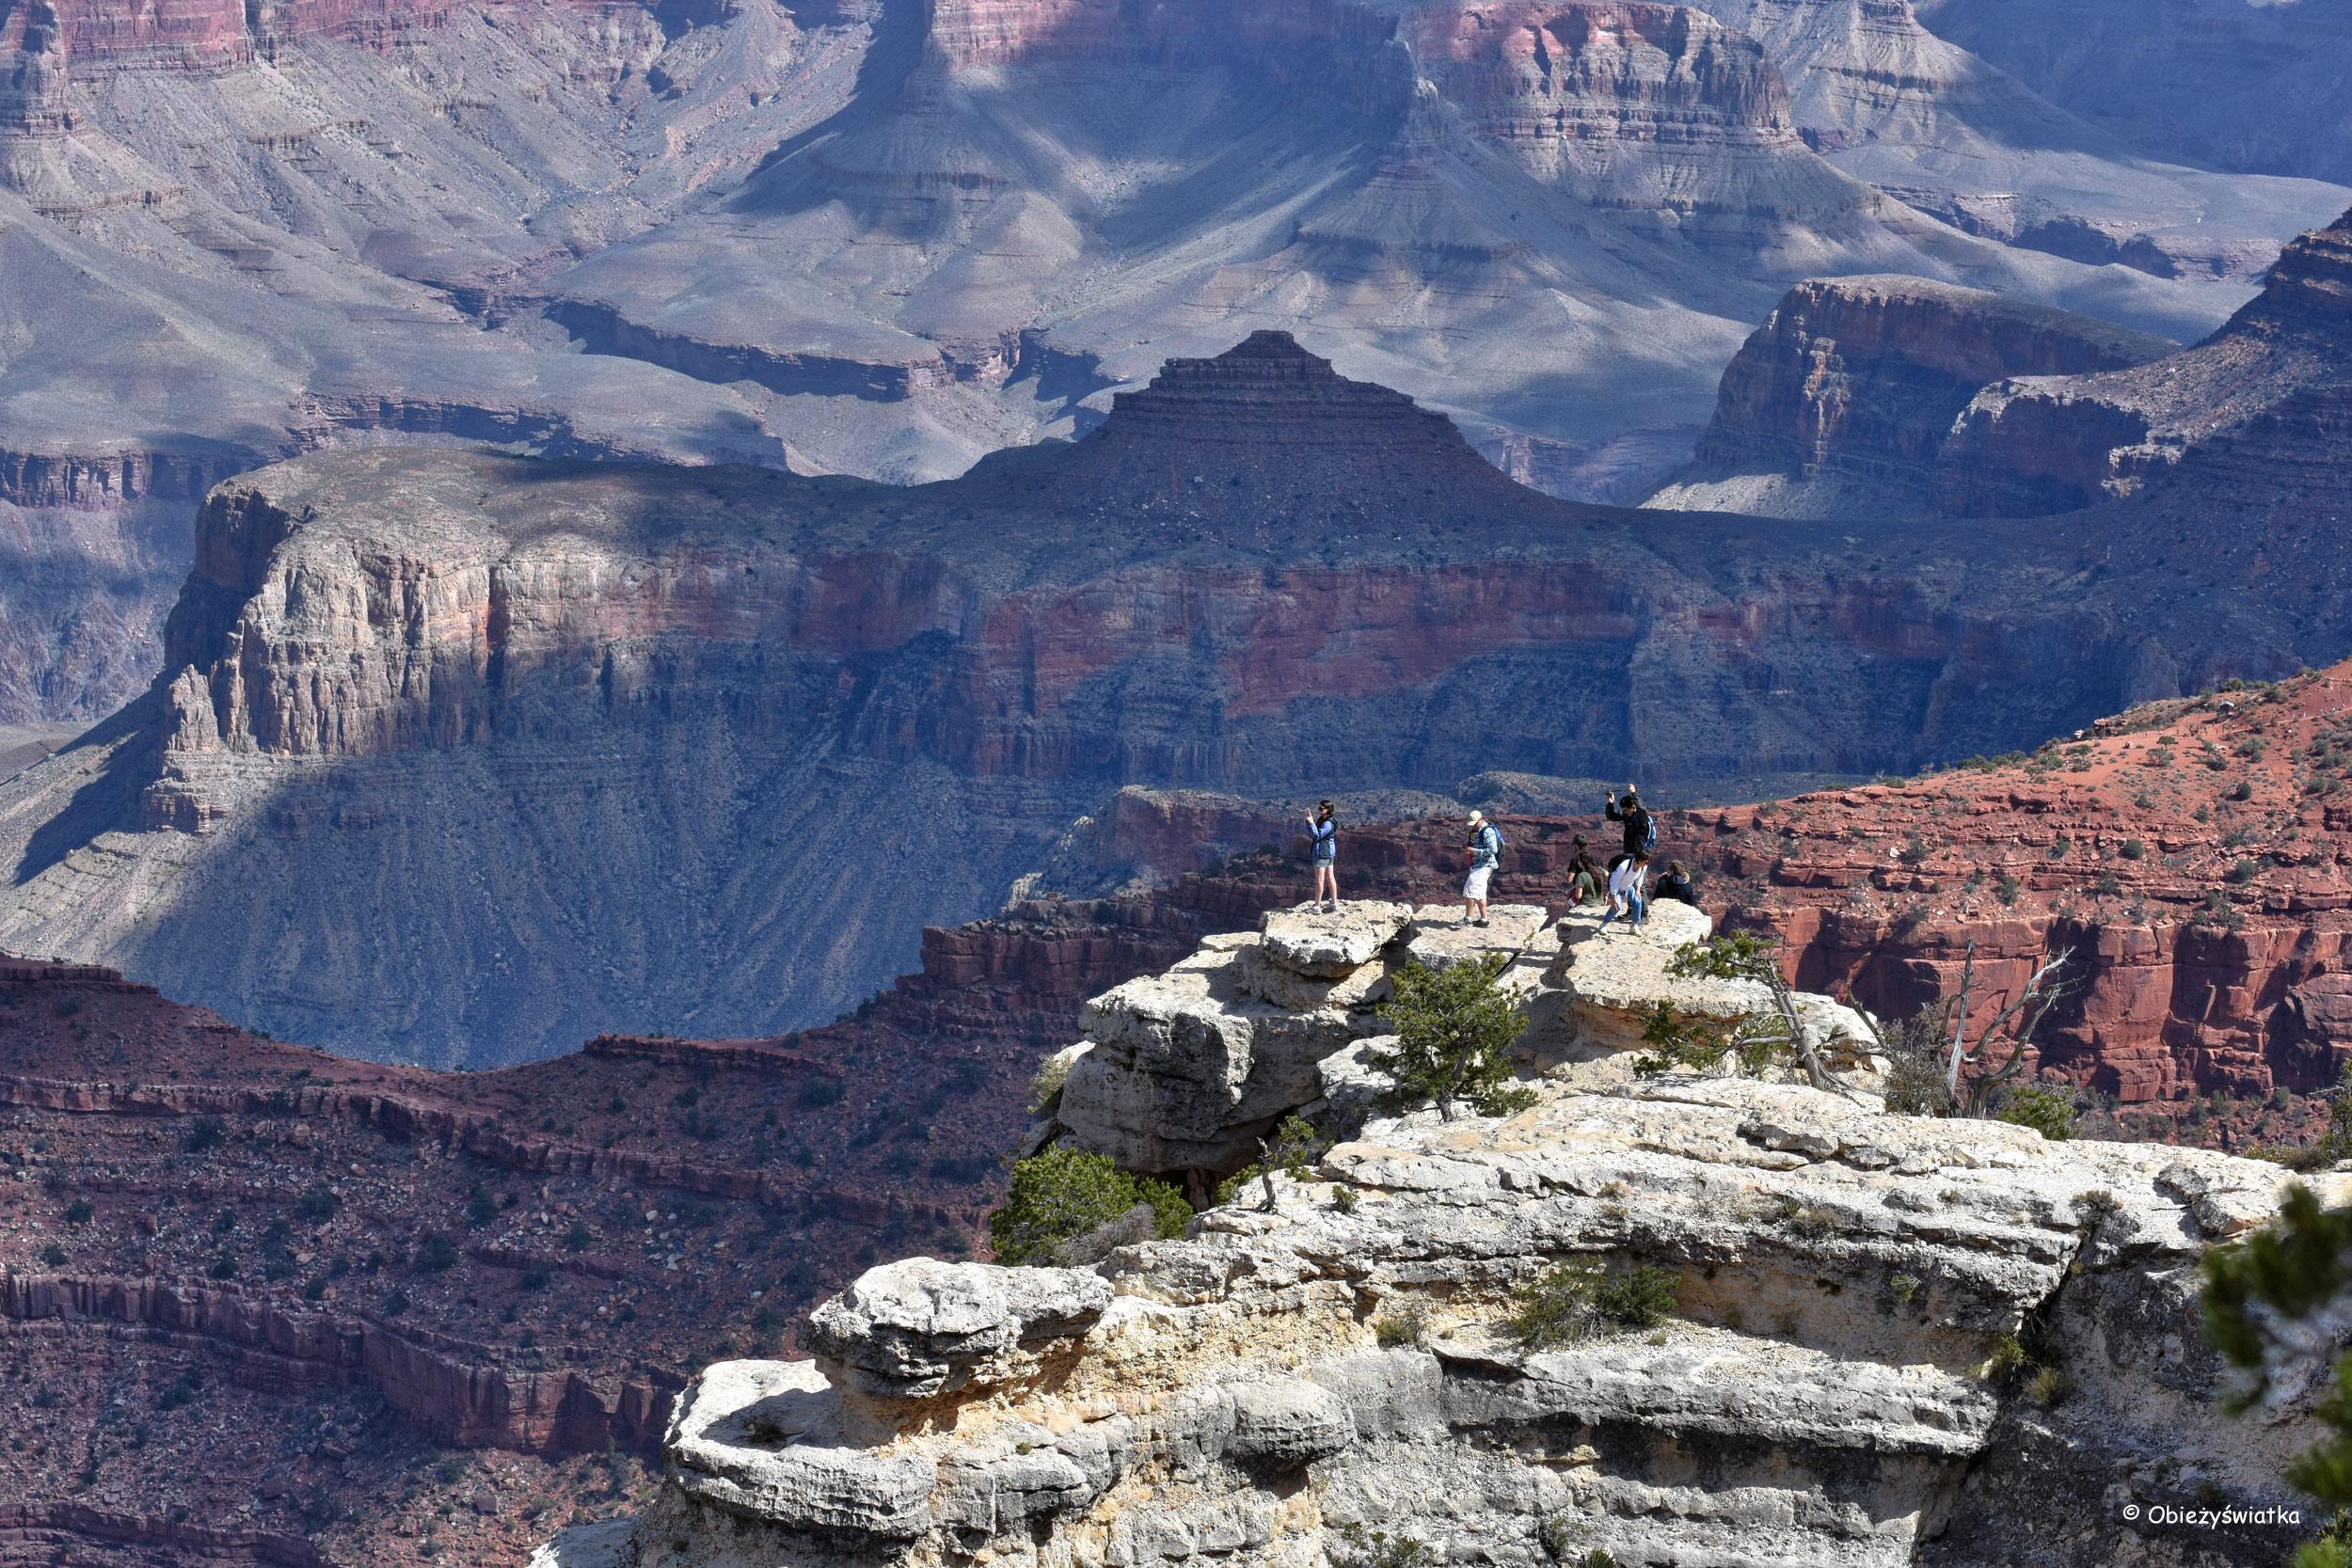 Niezapomniane widoki - Grand Canyon National Park, Arizona, USA